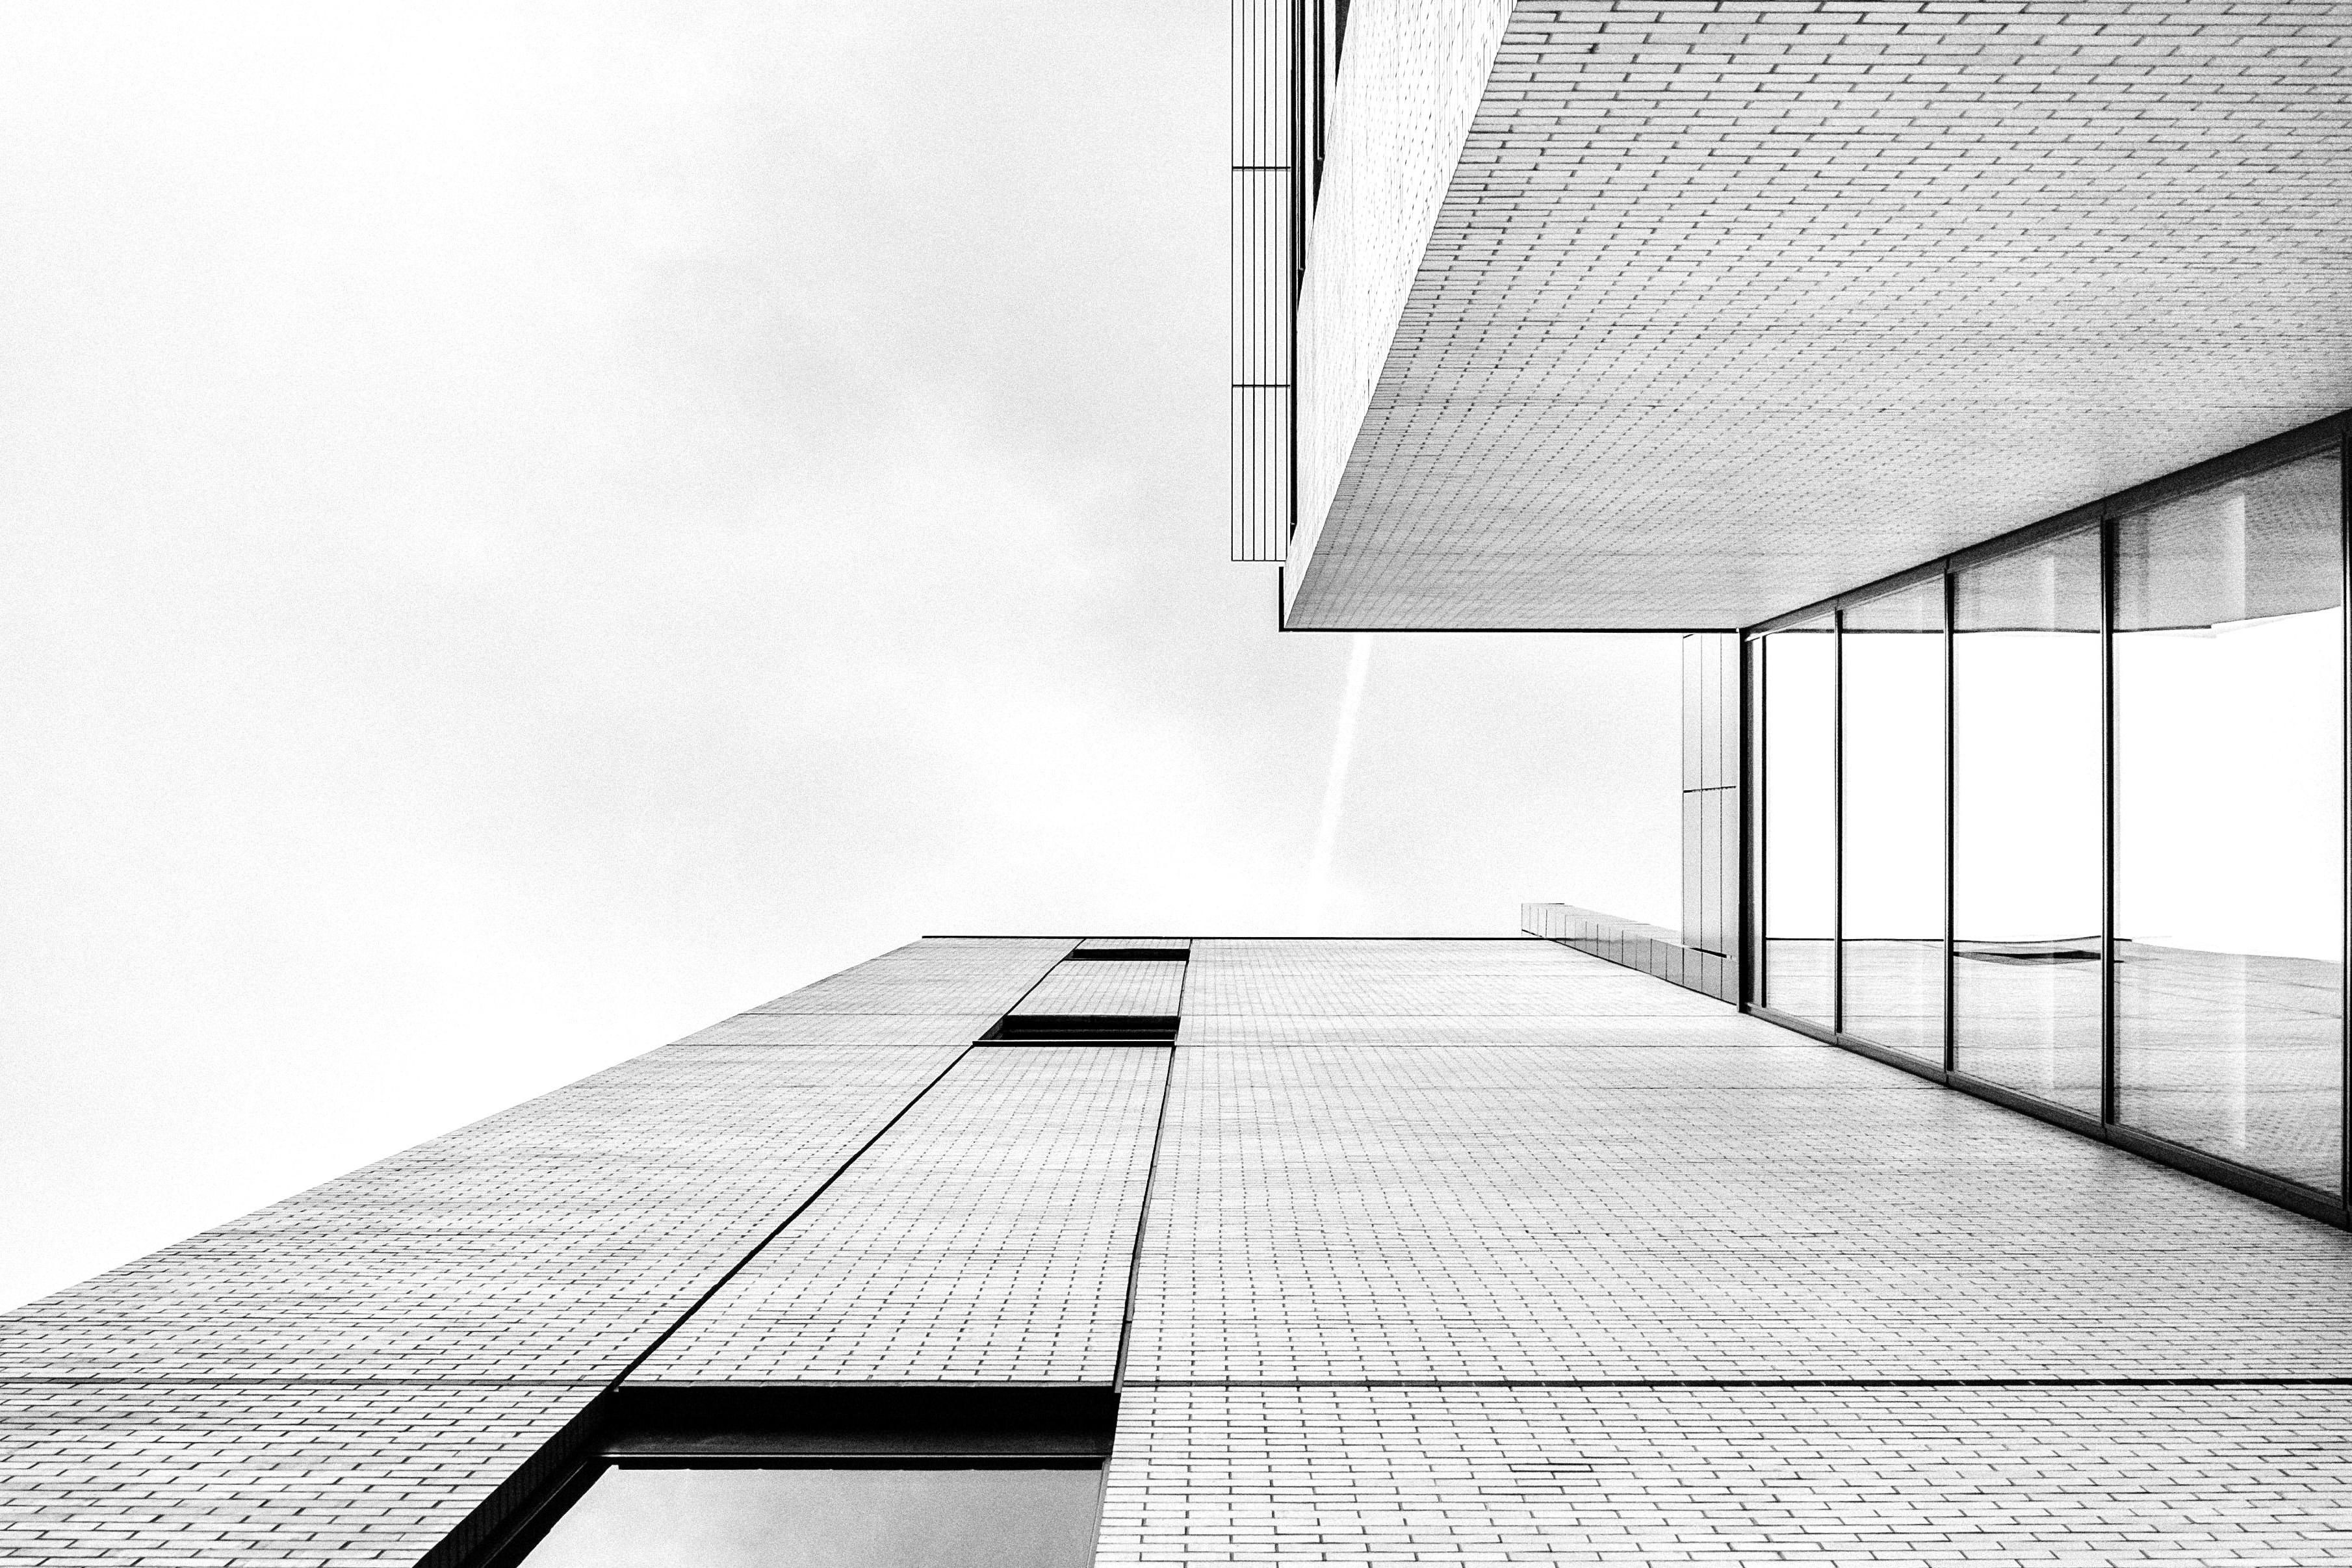 Medium Grey House Exterior